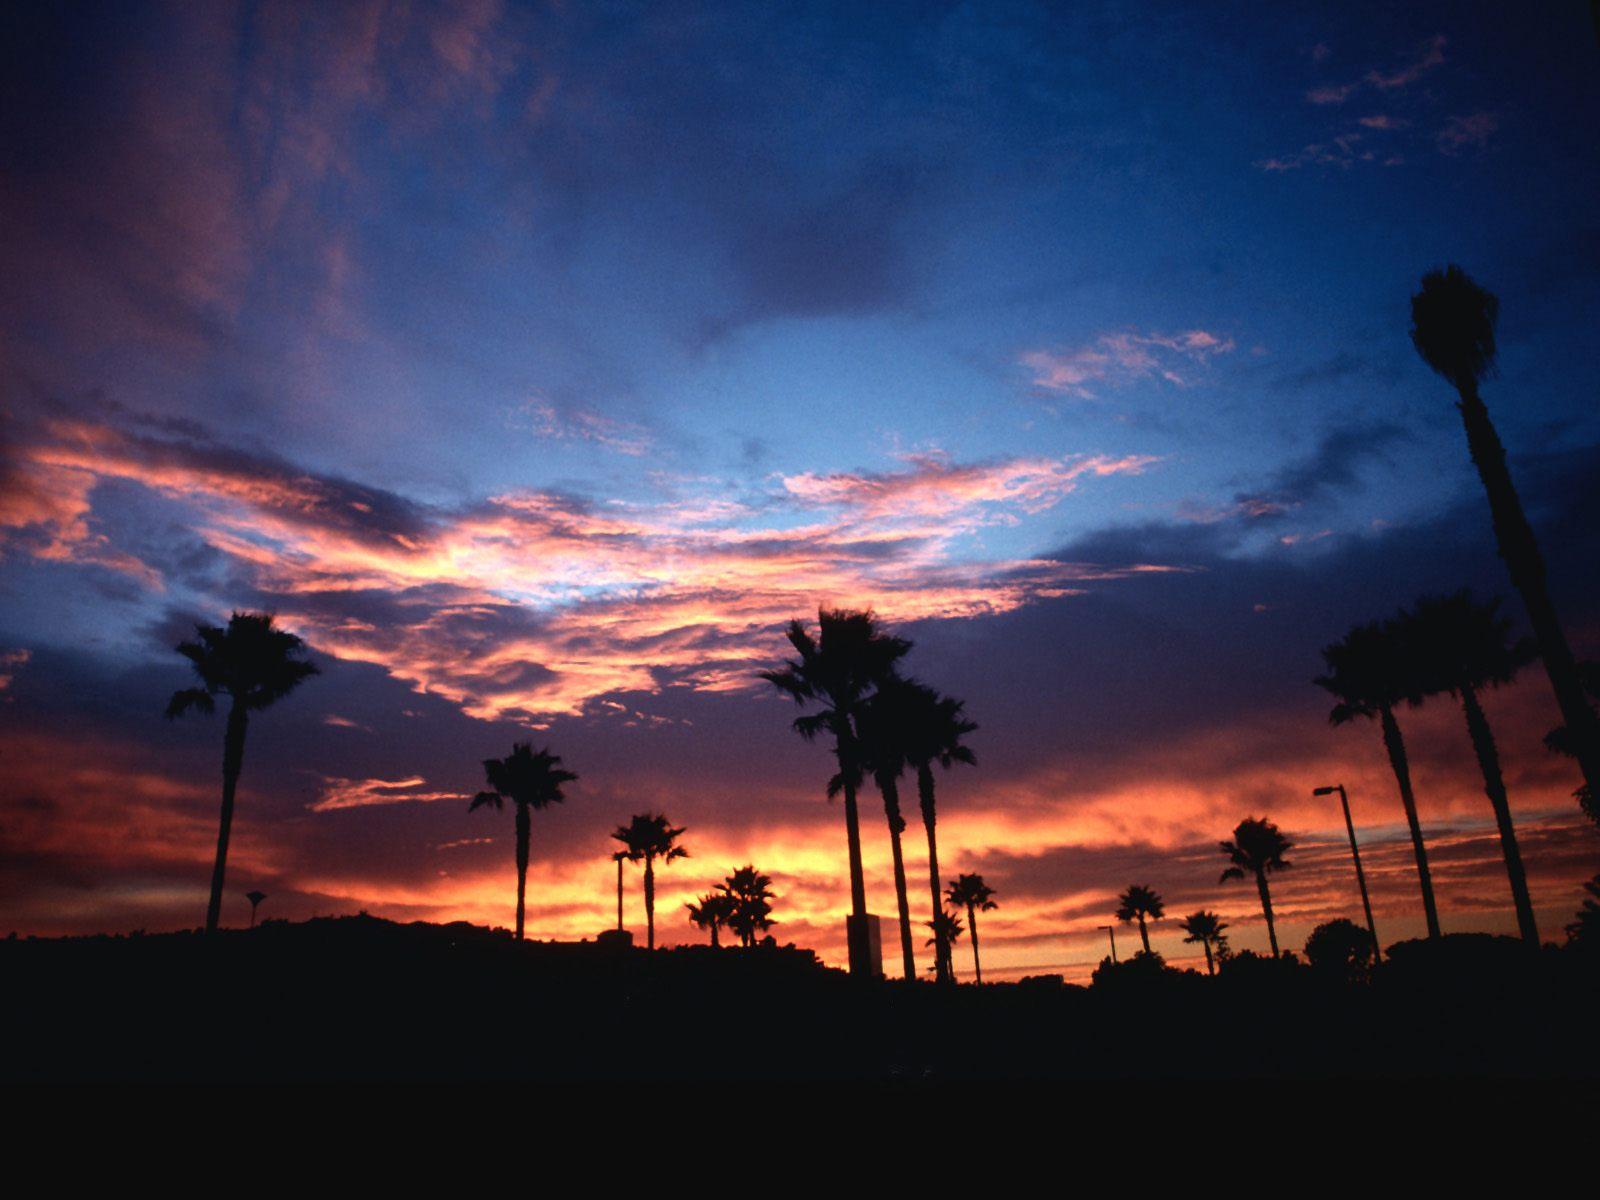 California Wallpaper: Charming California Sunset Wallpaper 1600x1200px